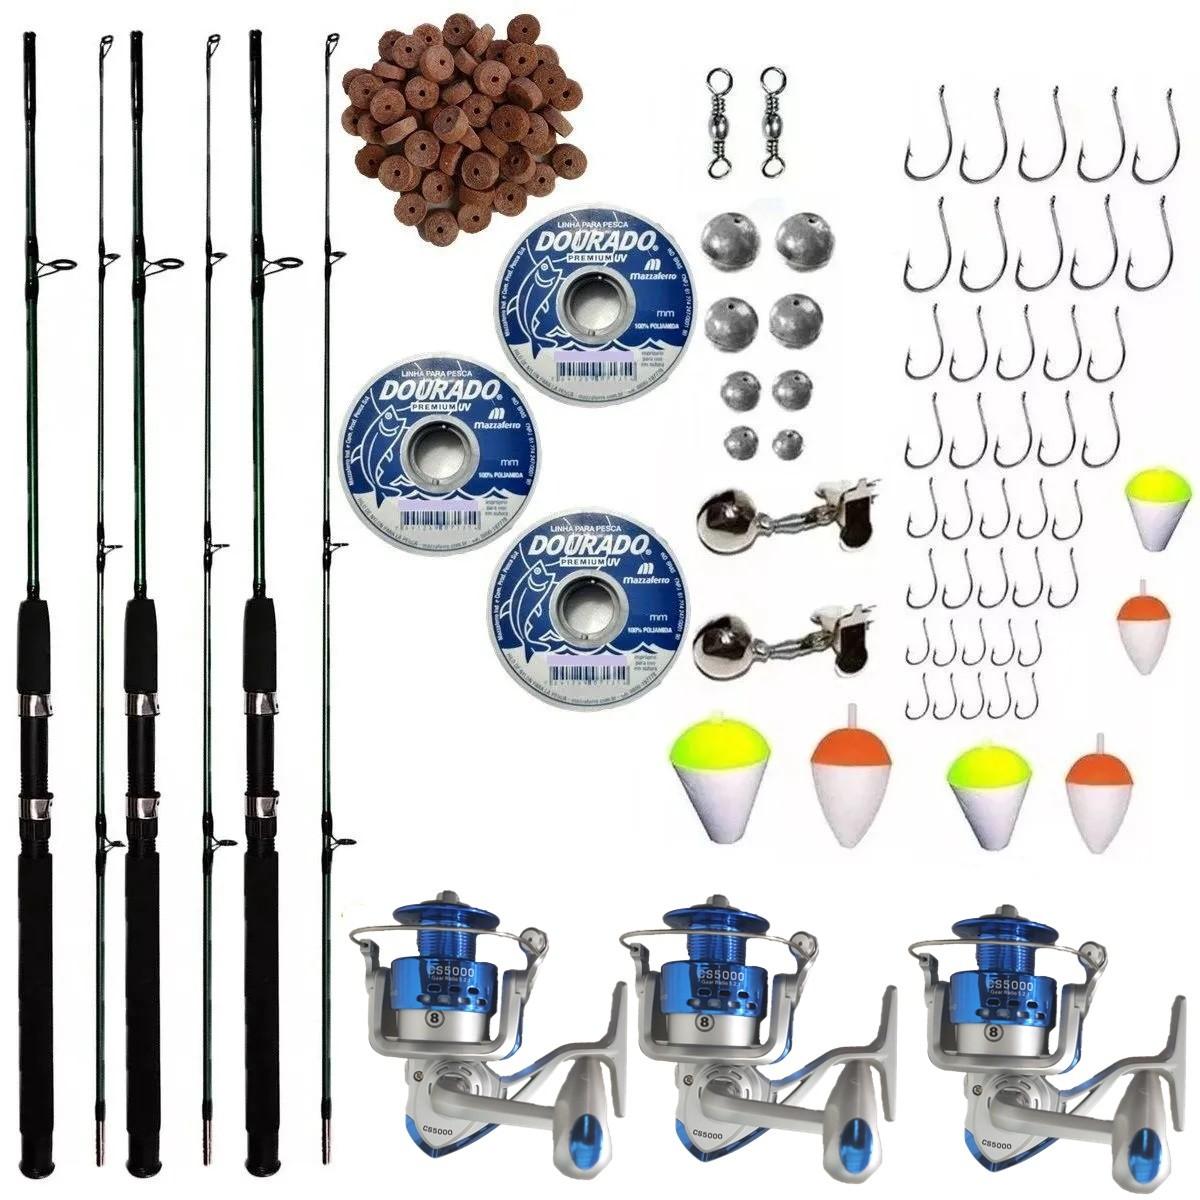 Kit De Pesca Completo 20kg 3 Vara 1,70m 3 Molinete 5000 Item